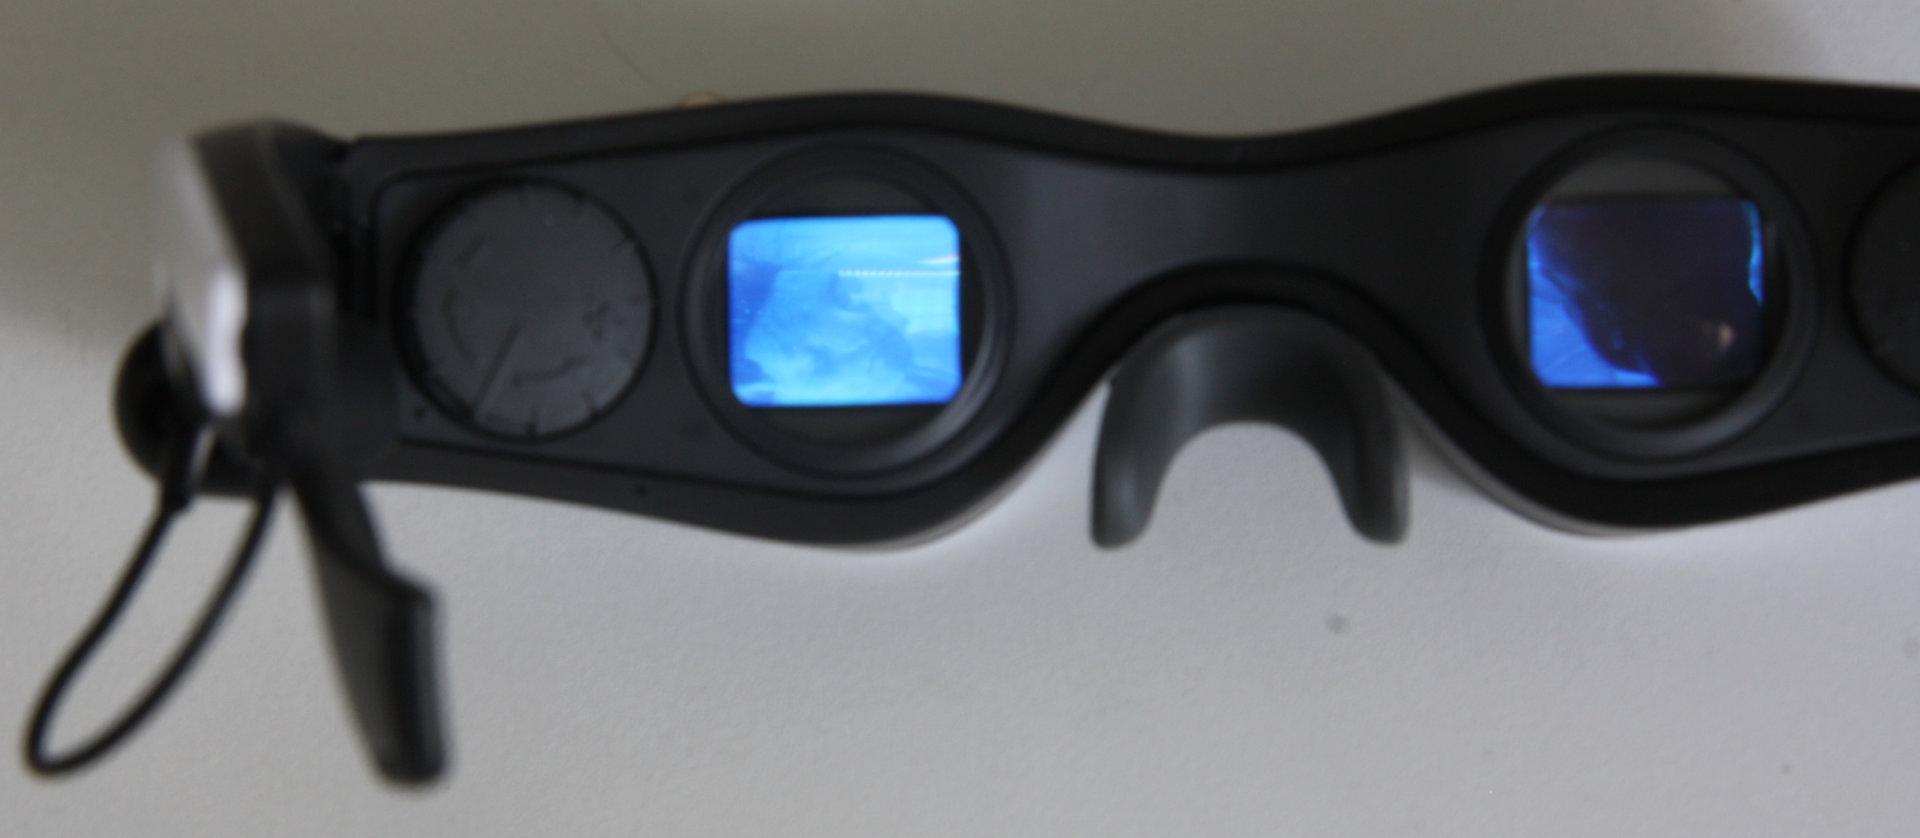 Cinemizer OLED im Betrieb